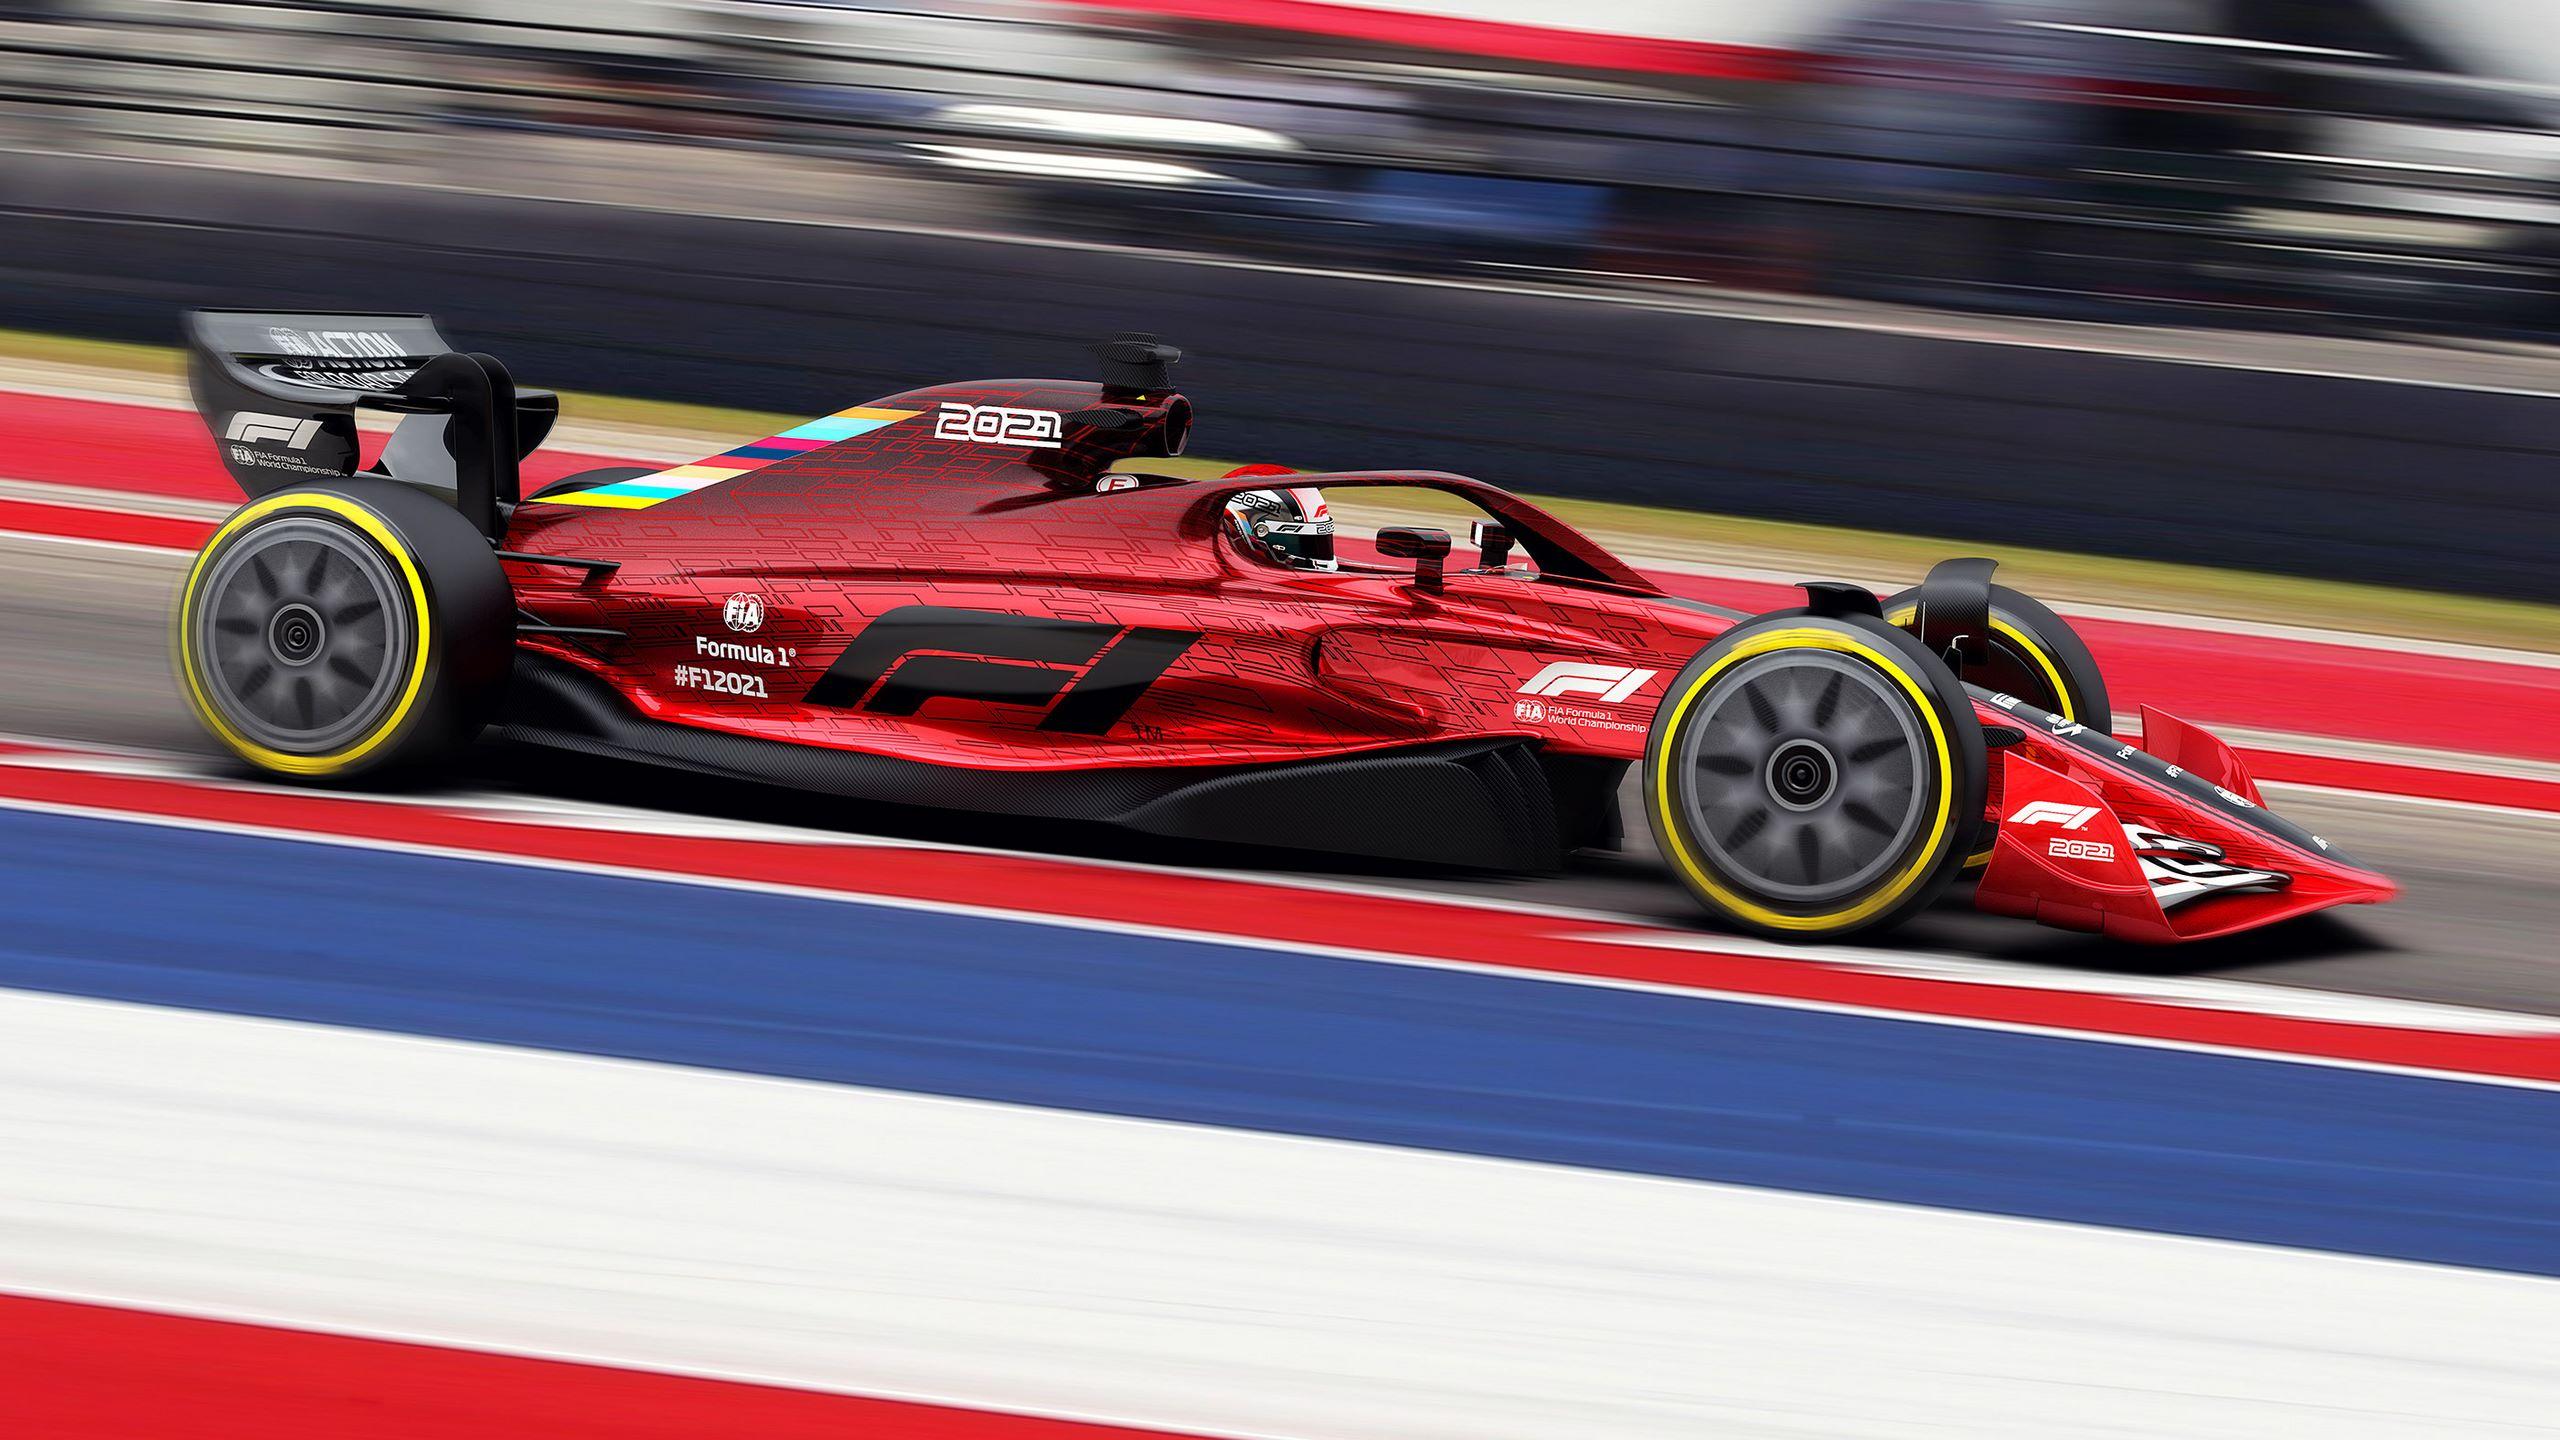 2021-formula-1-race-car-rendering f1 (13)